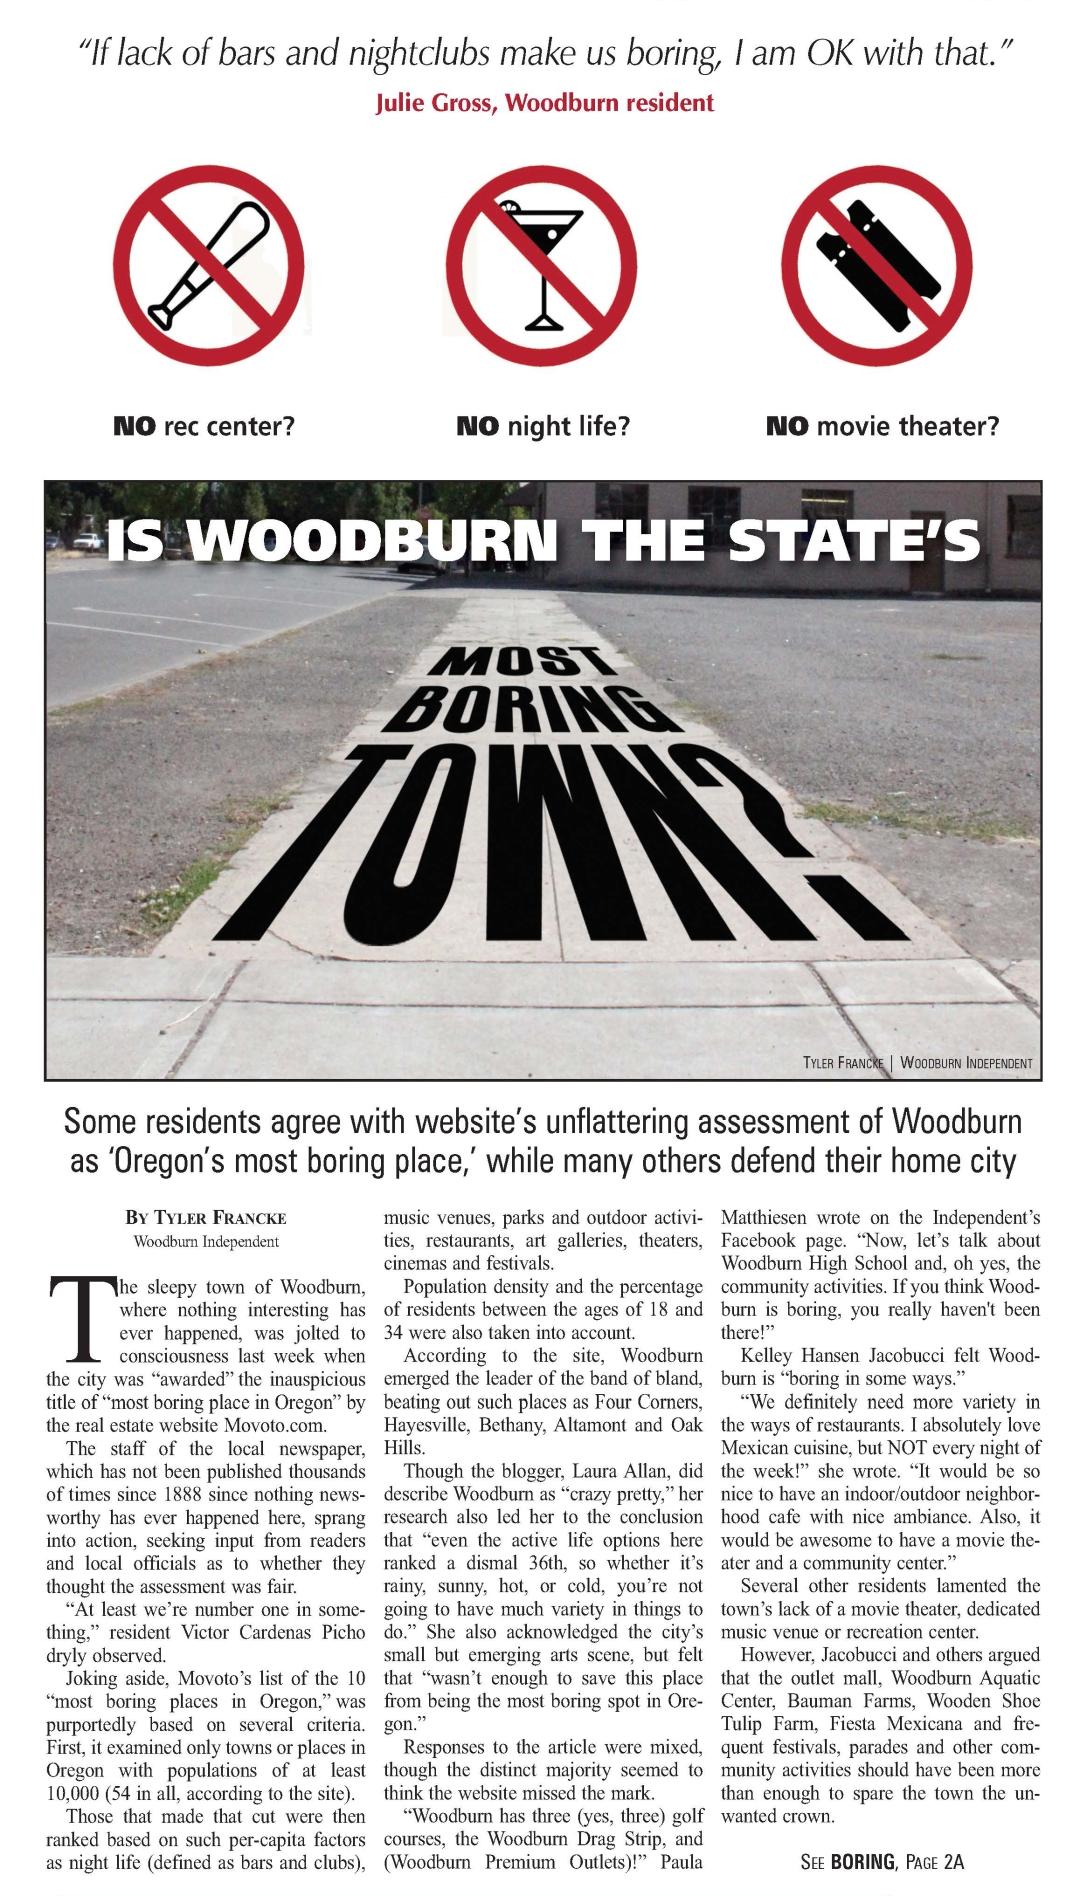 Woodburn Independent | Sept. 10, 2014